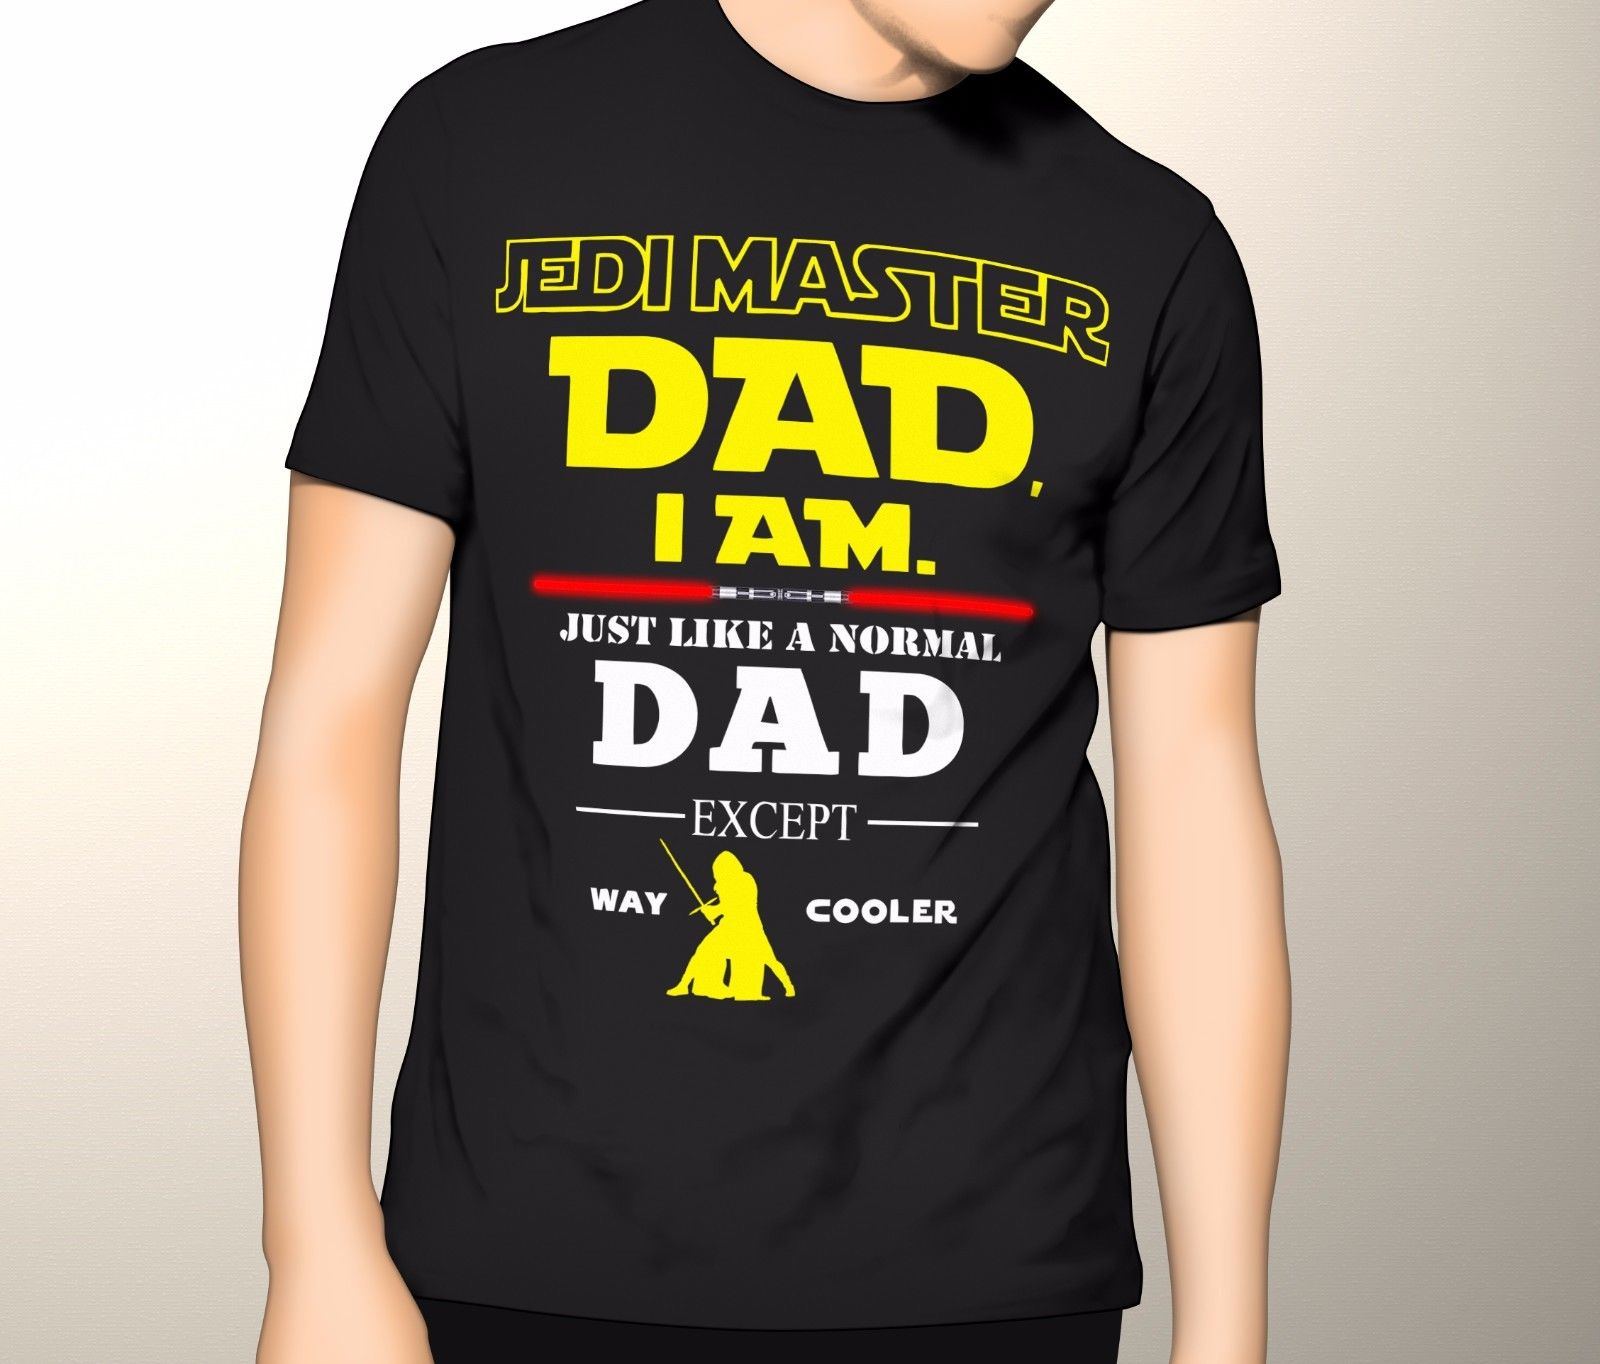 Jedi Master Dad Shirt, Star Wars Fathers Day Shirt, Premium Graphic T-Shirt T-Shirt Short Sleeve Mens